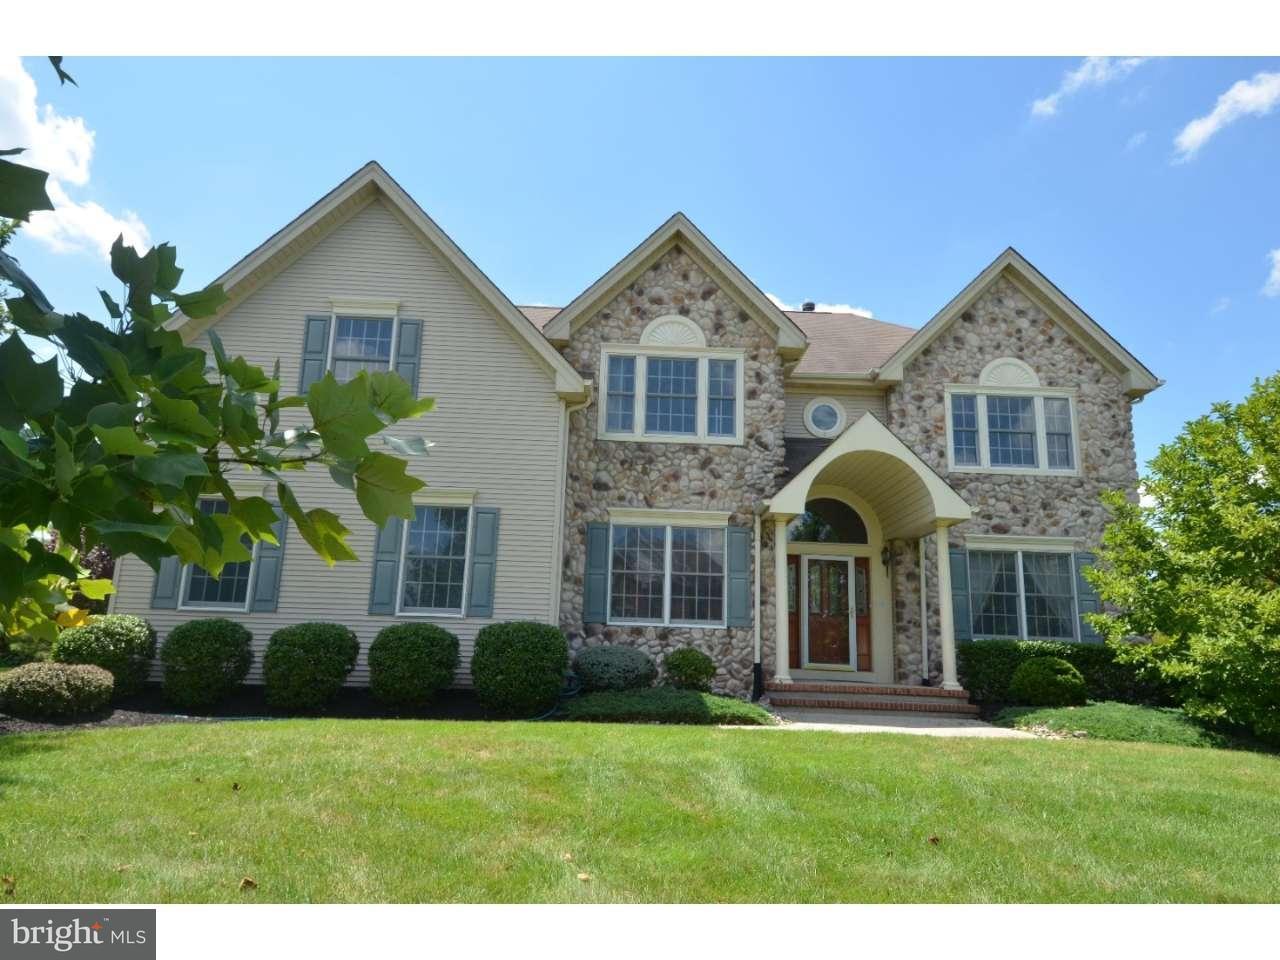 Casa Unifamiliar por un Alquiler en 7 CLYDESDALE Court Plainsboro, Nueva Jersey 08536 Estados UnidosEn/Alrededor: Plainsboro Township